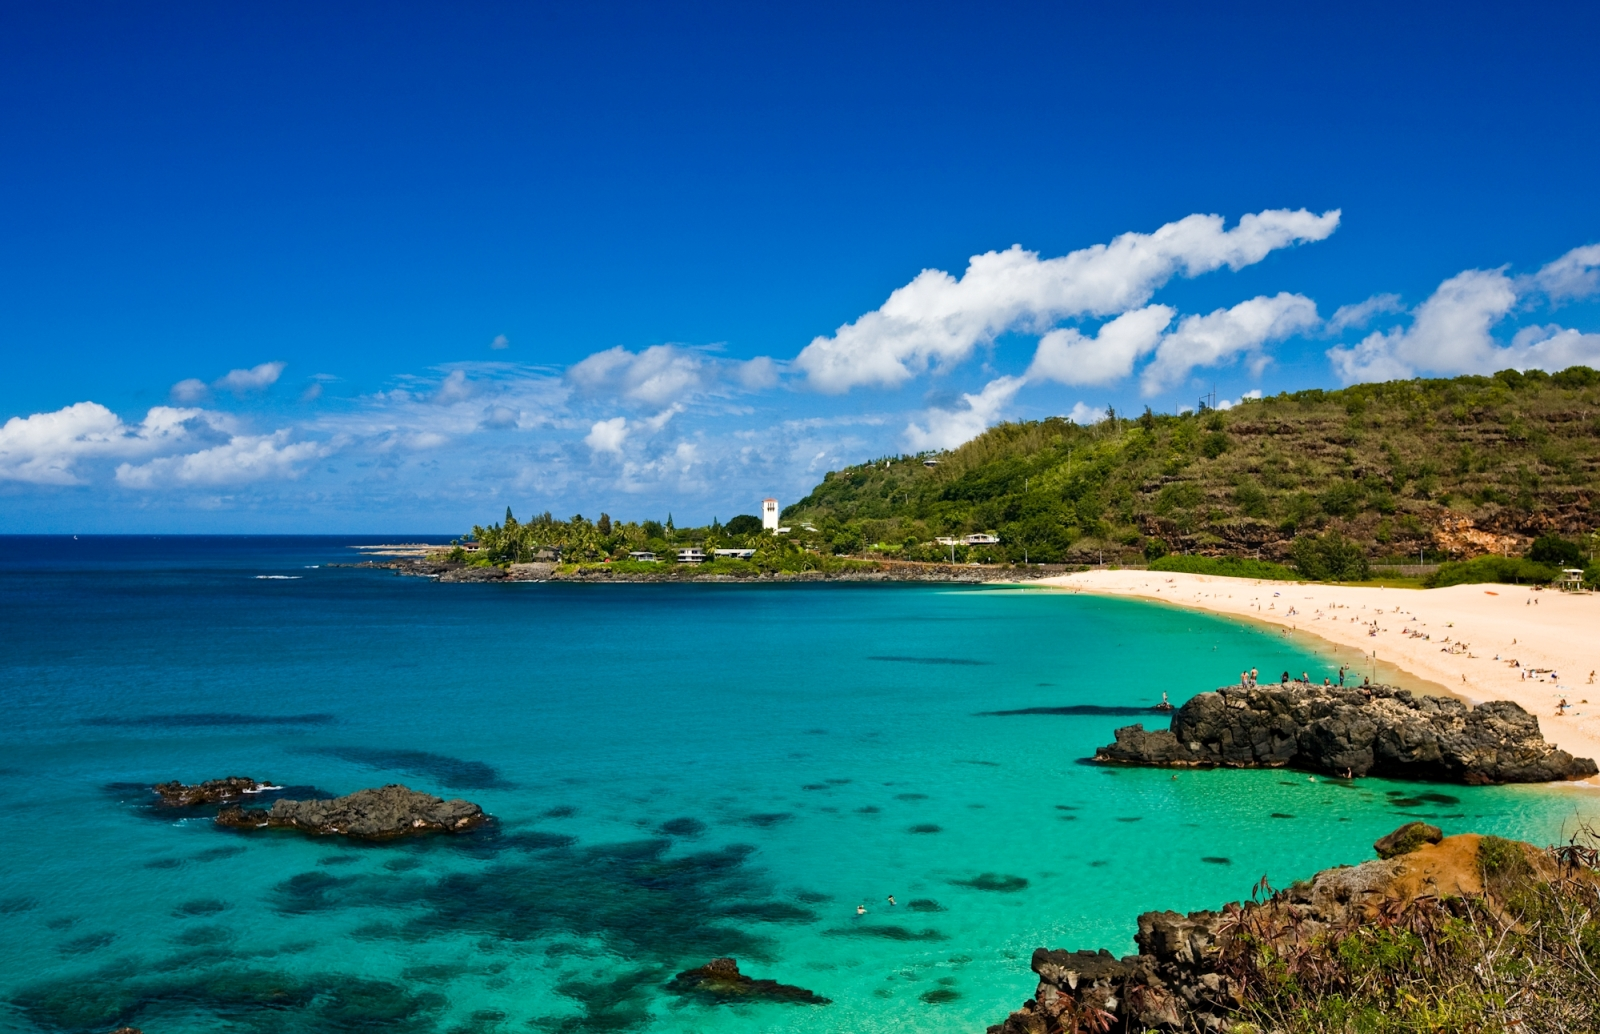 Hawaii Tourism Authority (HTA)/Tor Johnson